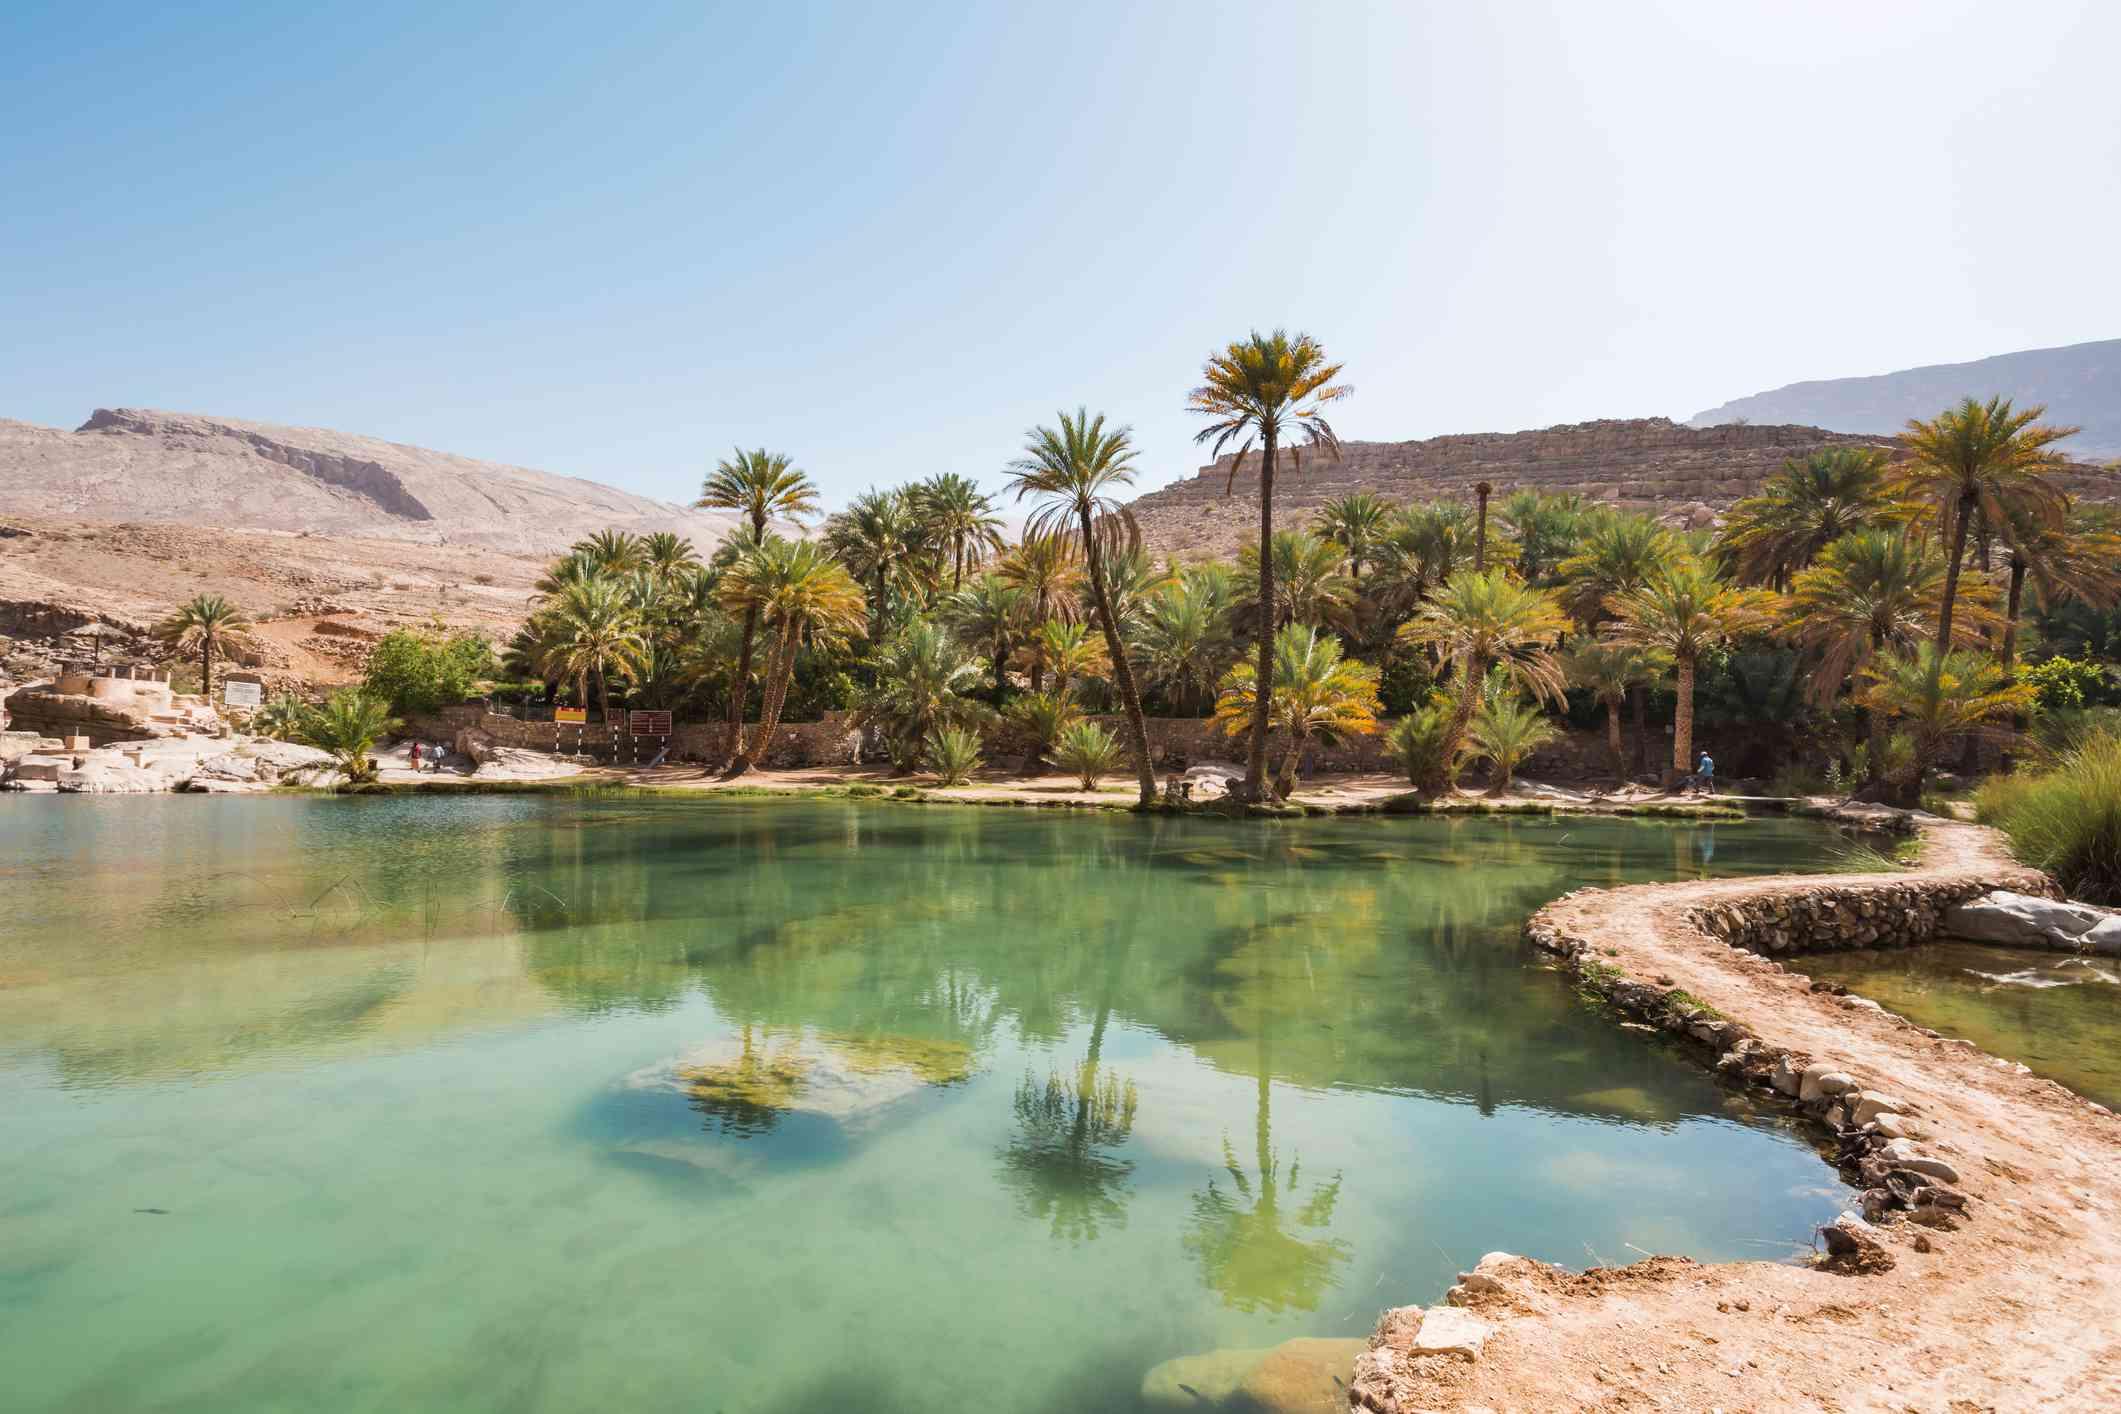 Palm trees around the Wadi Bani Khalid oasis